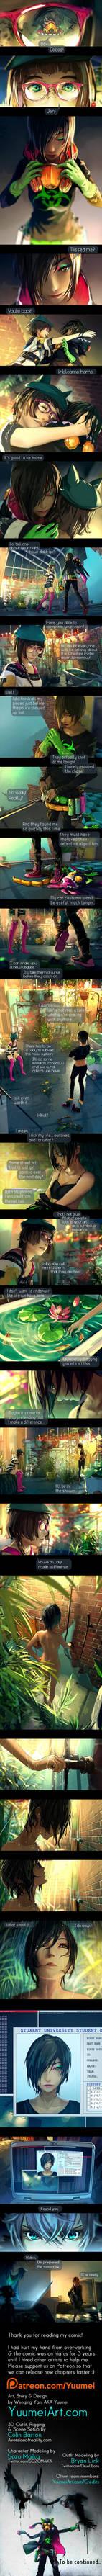 Fisheye Placebo: Ch1- Part 7 by yuumei